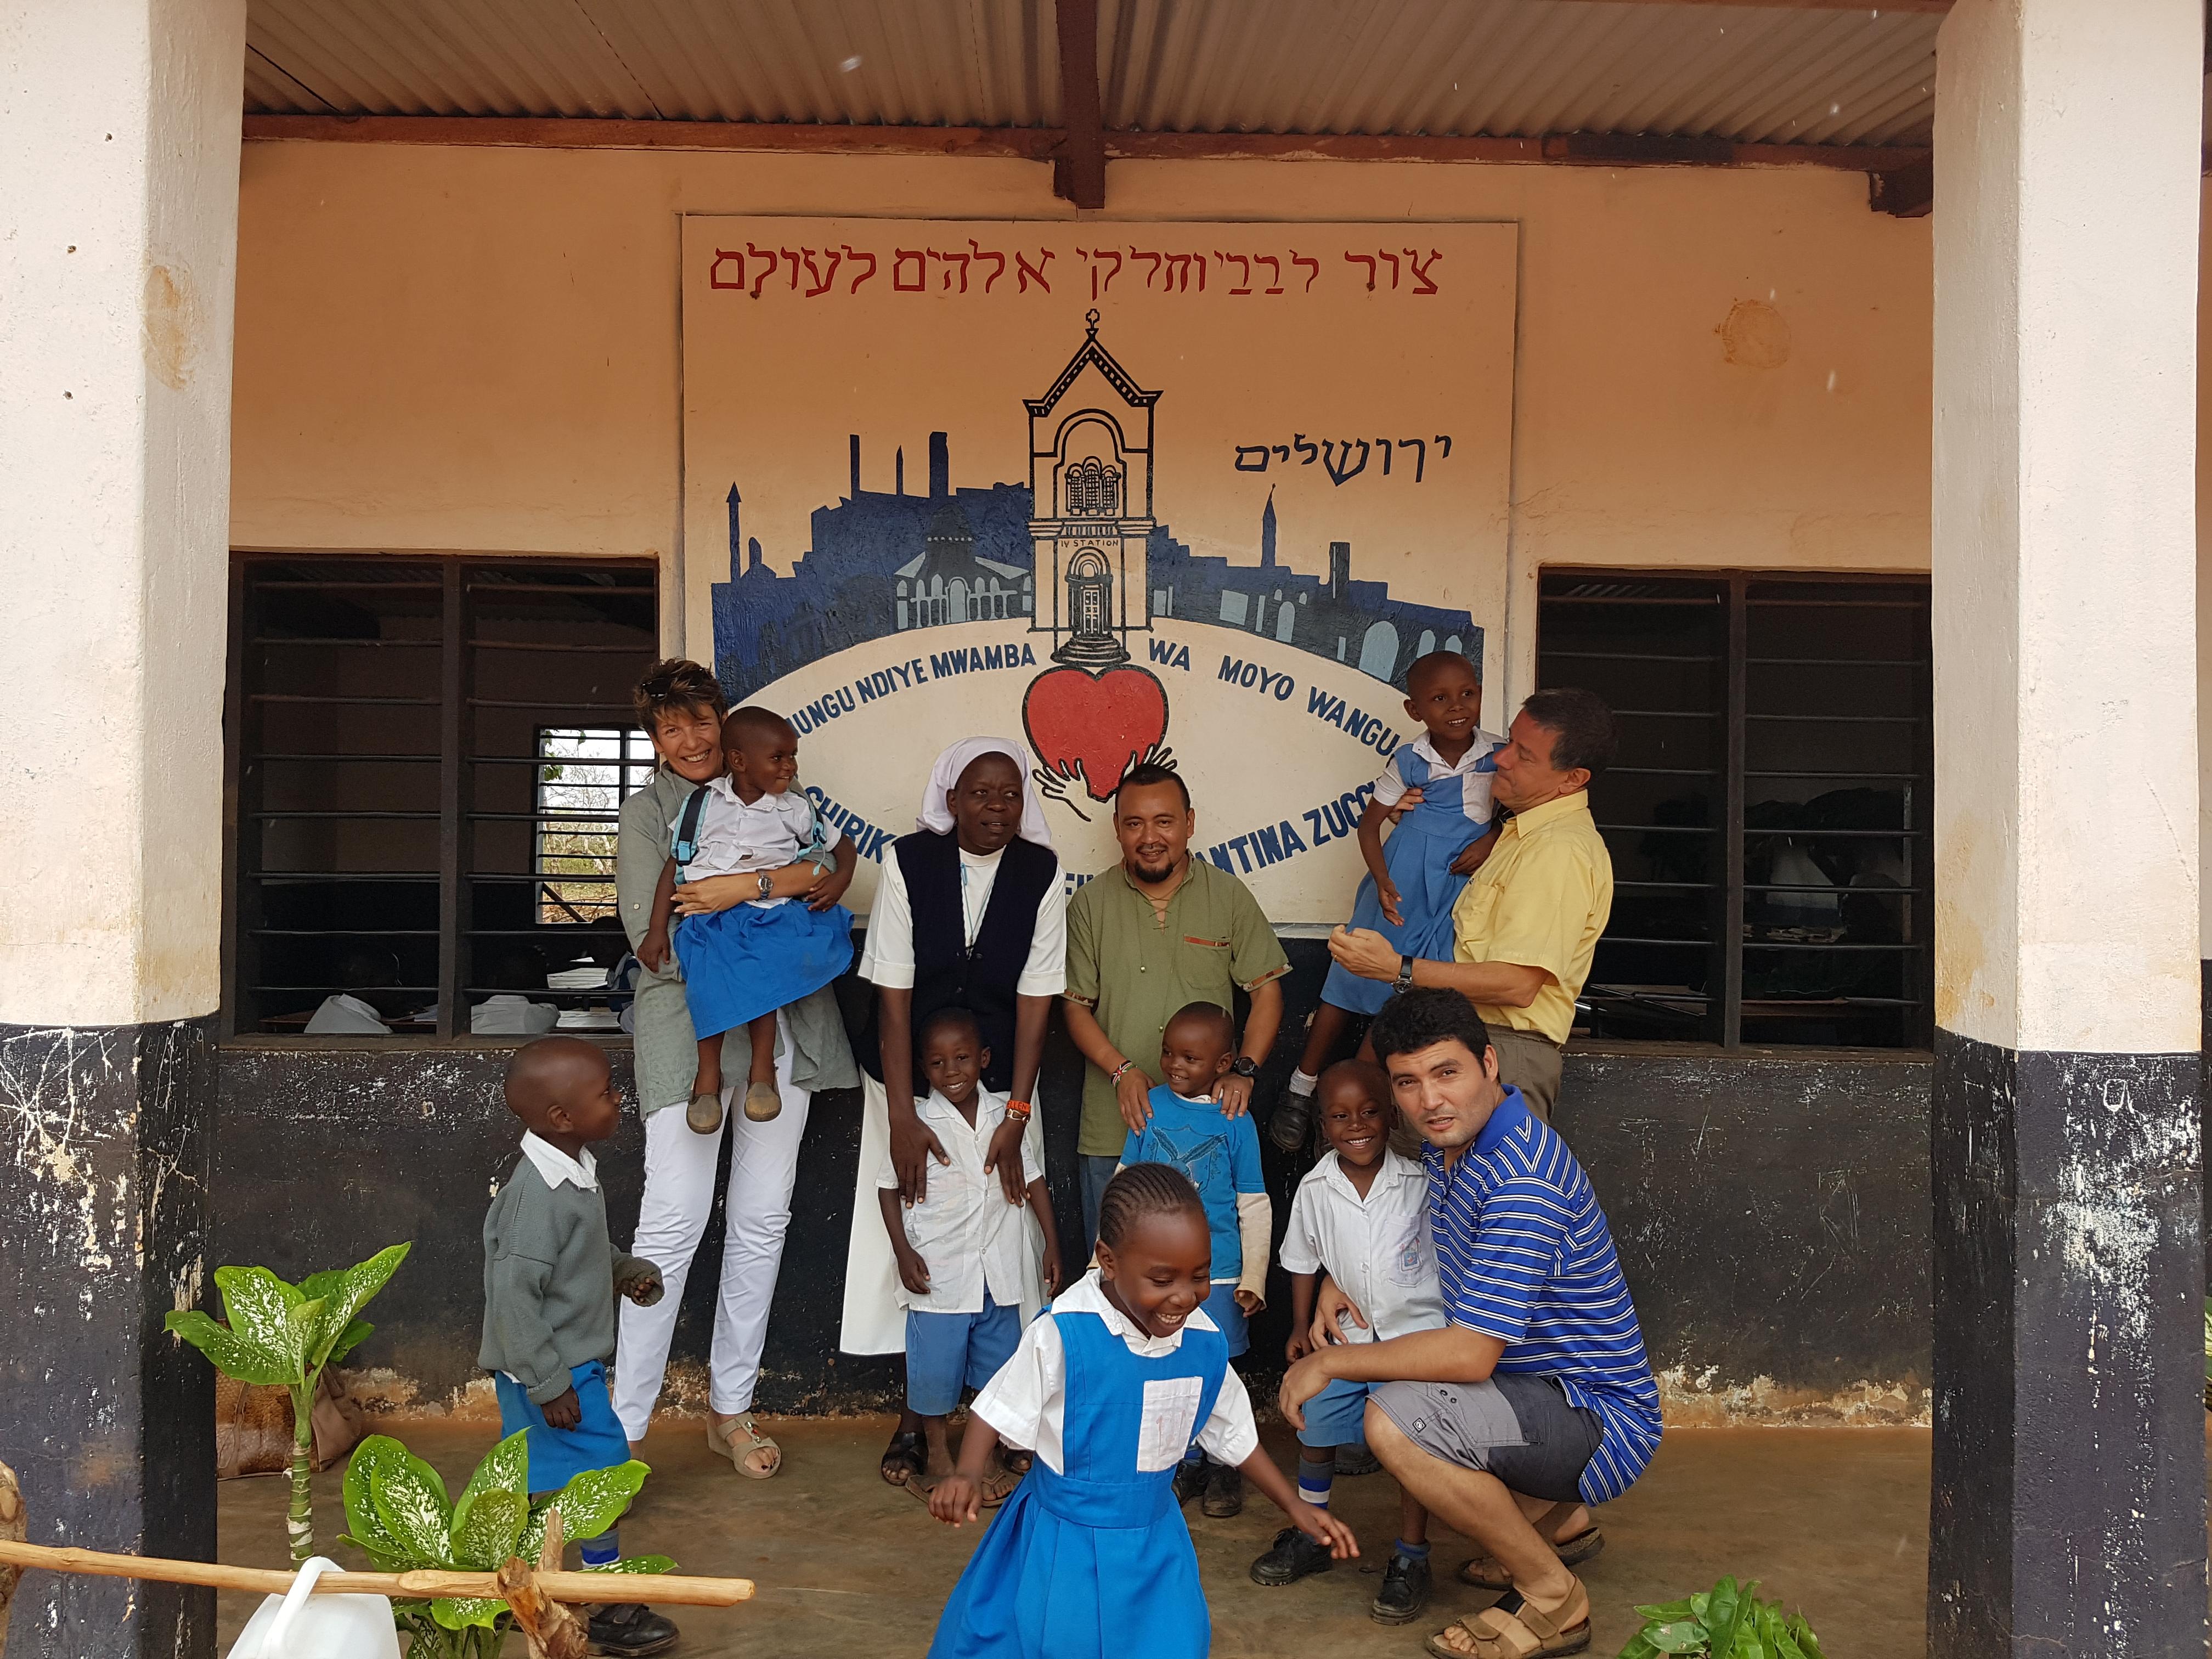 terza aula scolastica in Kenya